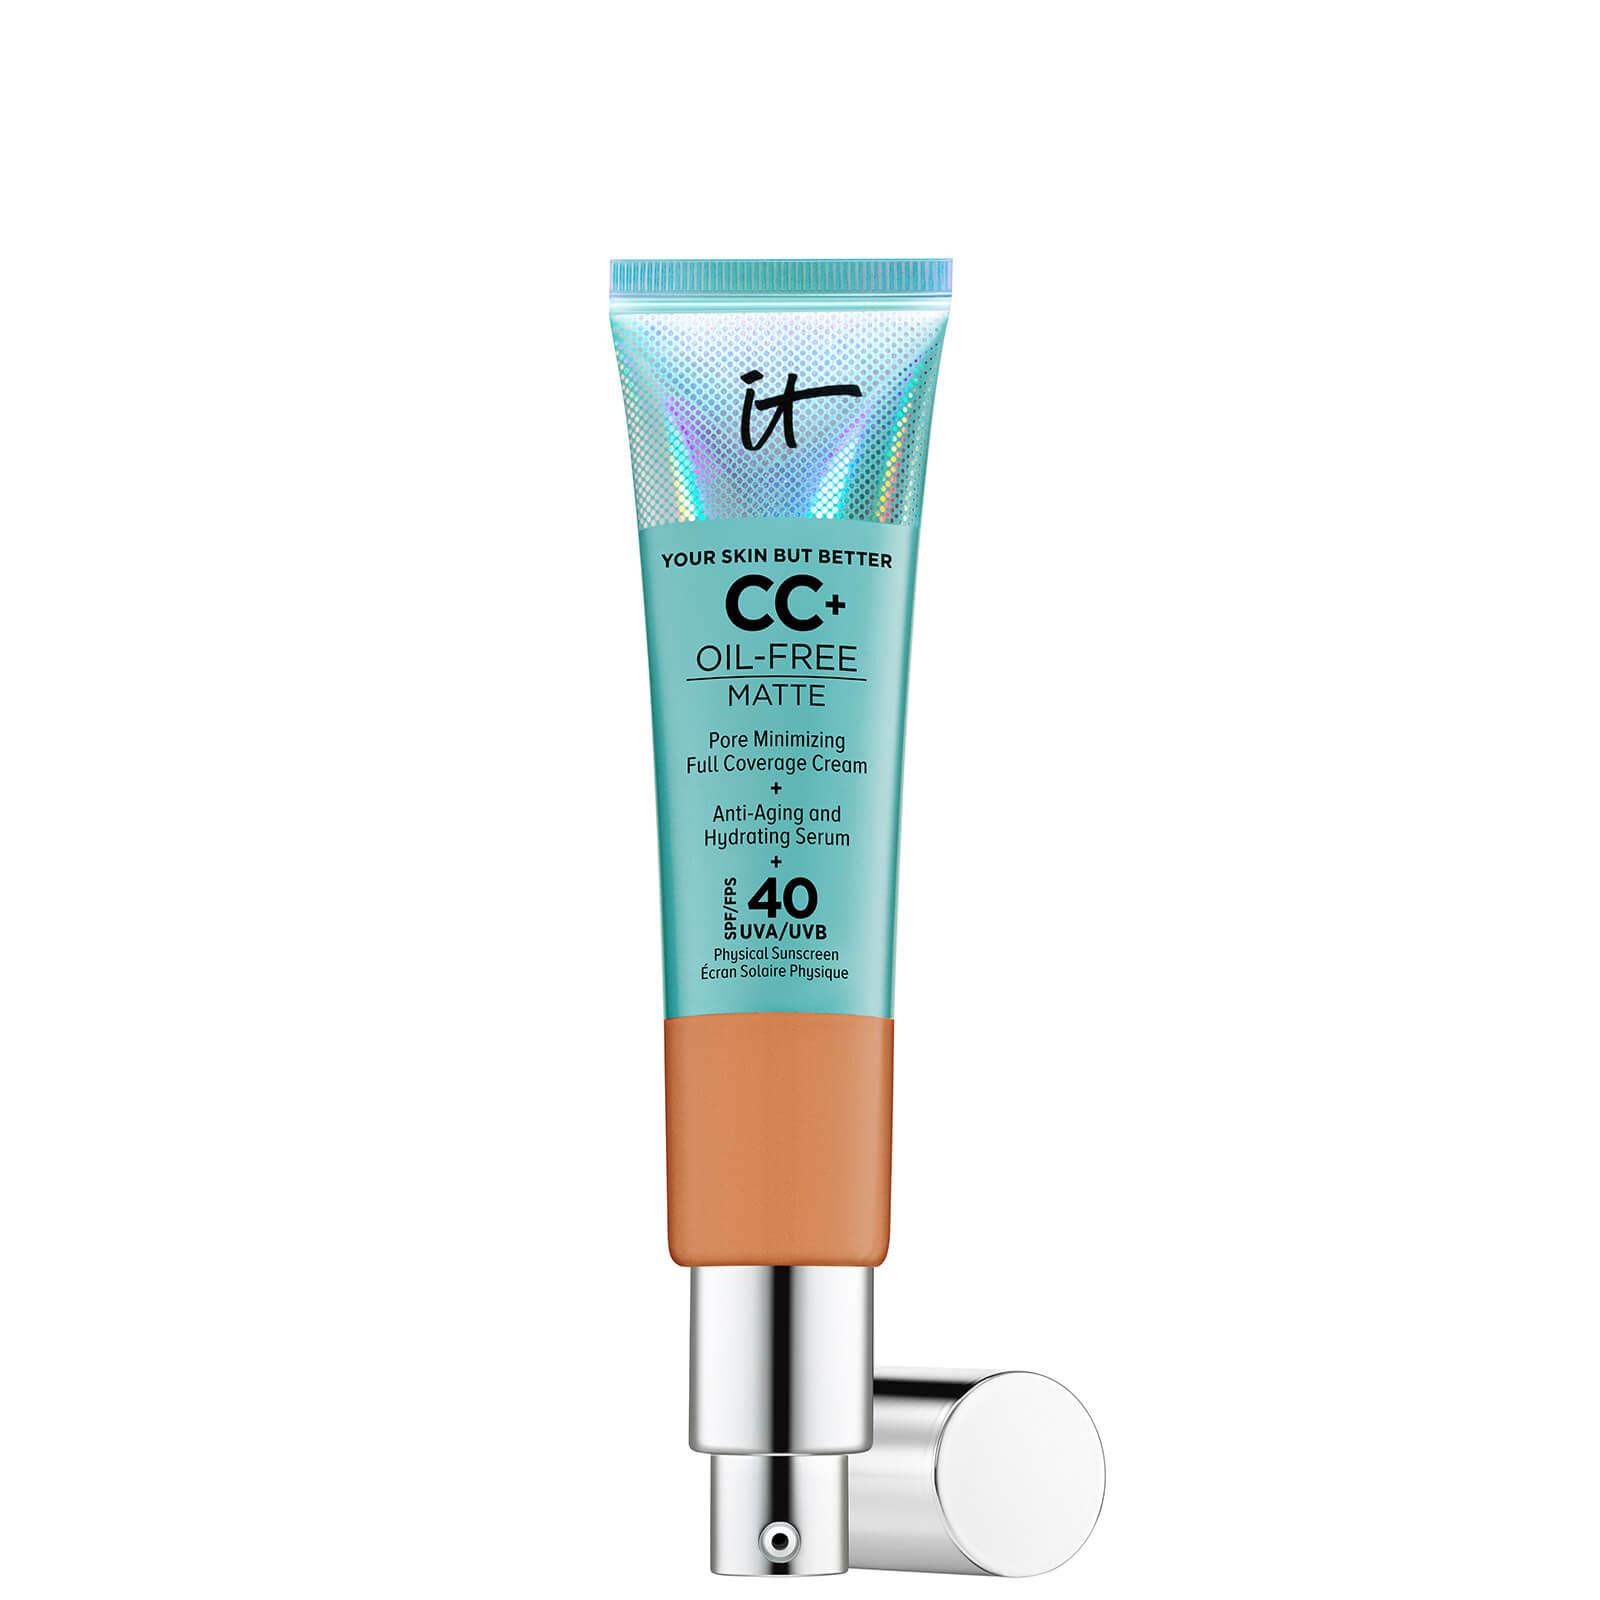 Купить IT Cosmetics Your Skin But Better CC+ Oil-Free Matte SPF40 32ml (Various Shades) - Tan